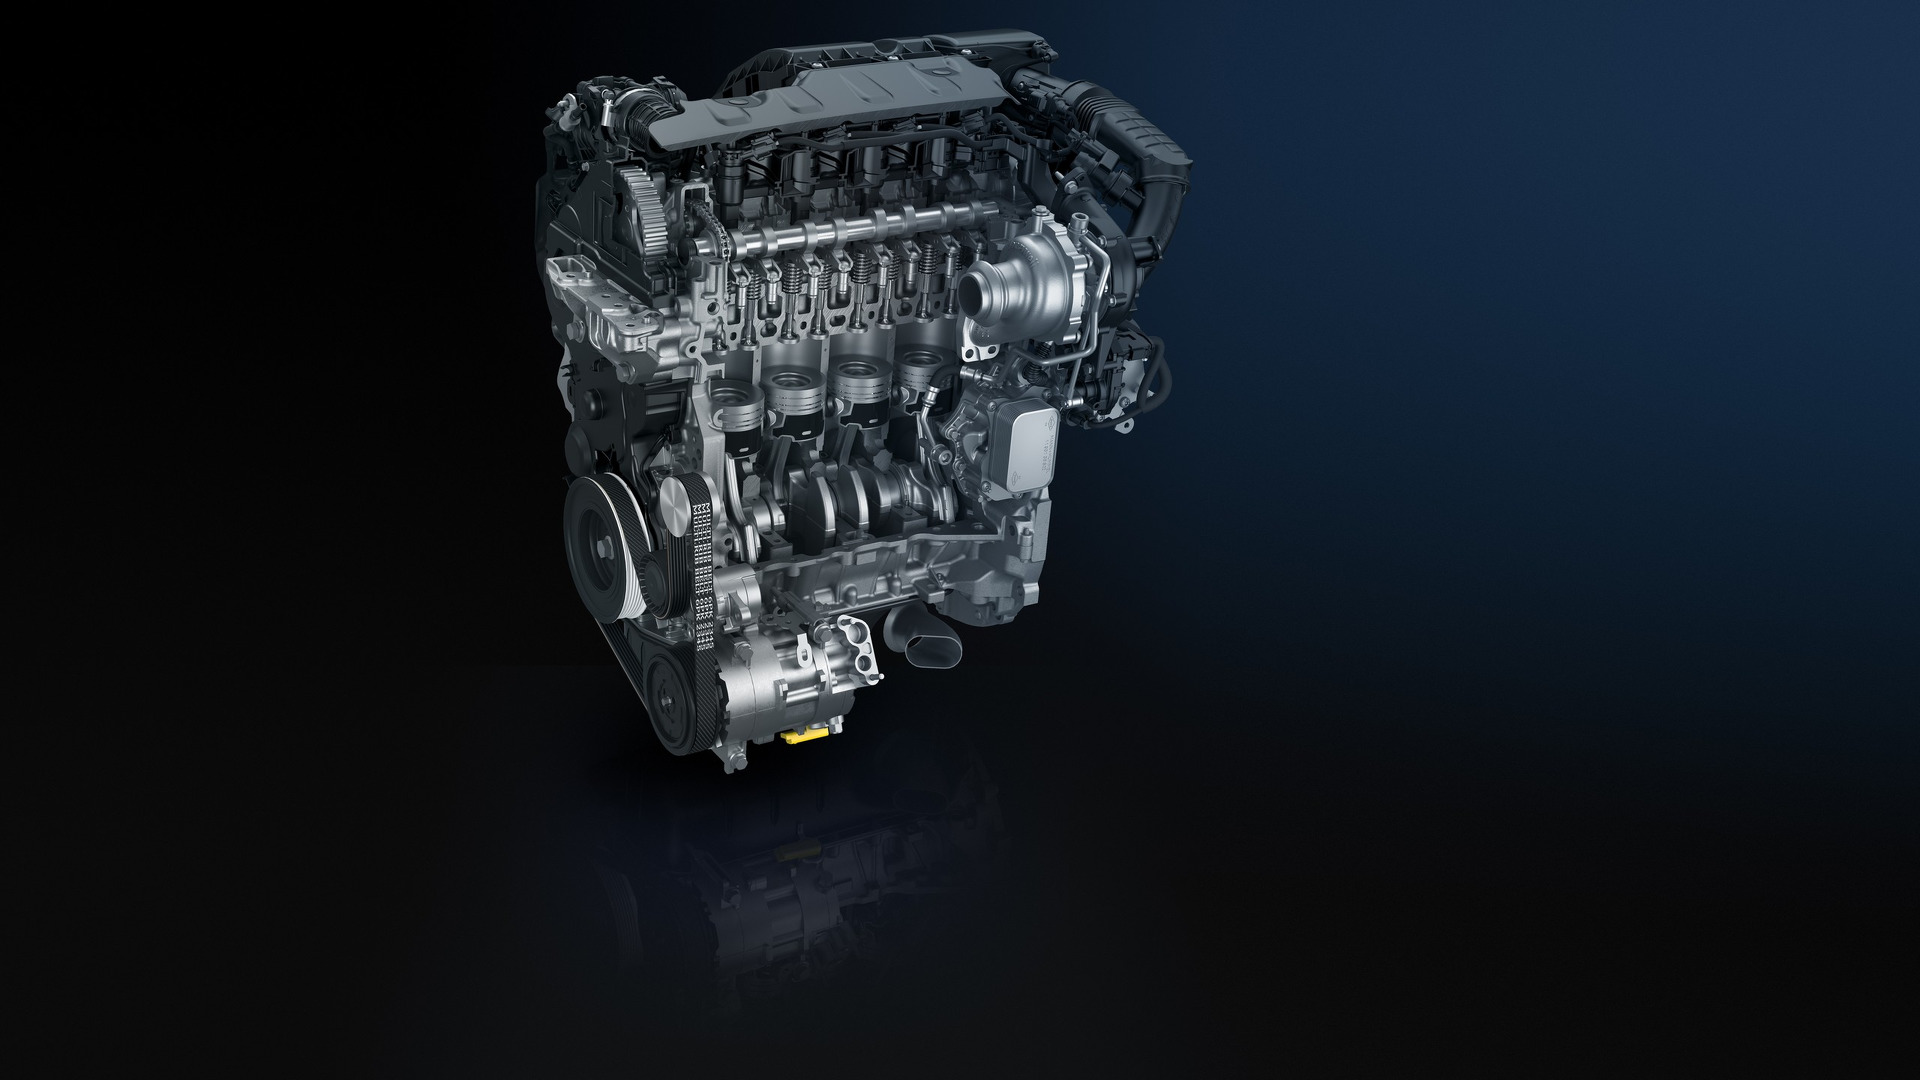 2018-peugeot-308-facelift (10)